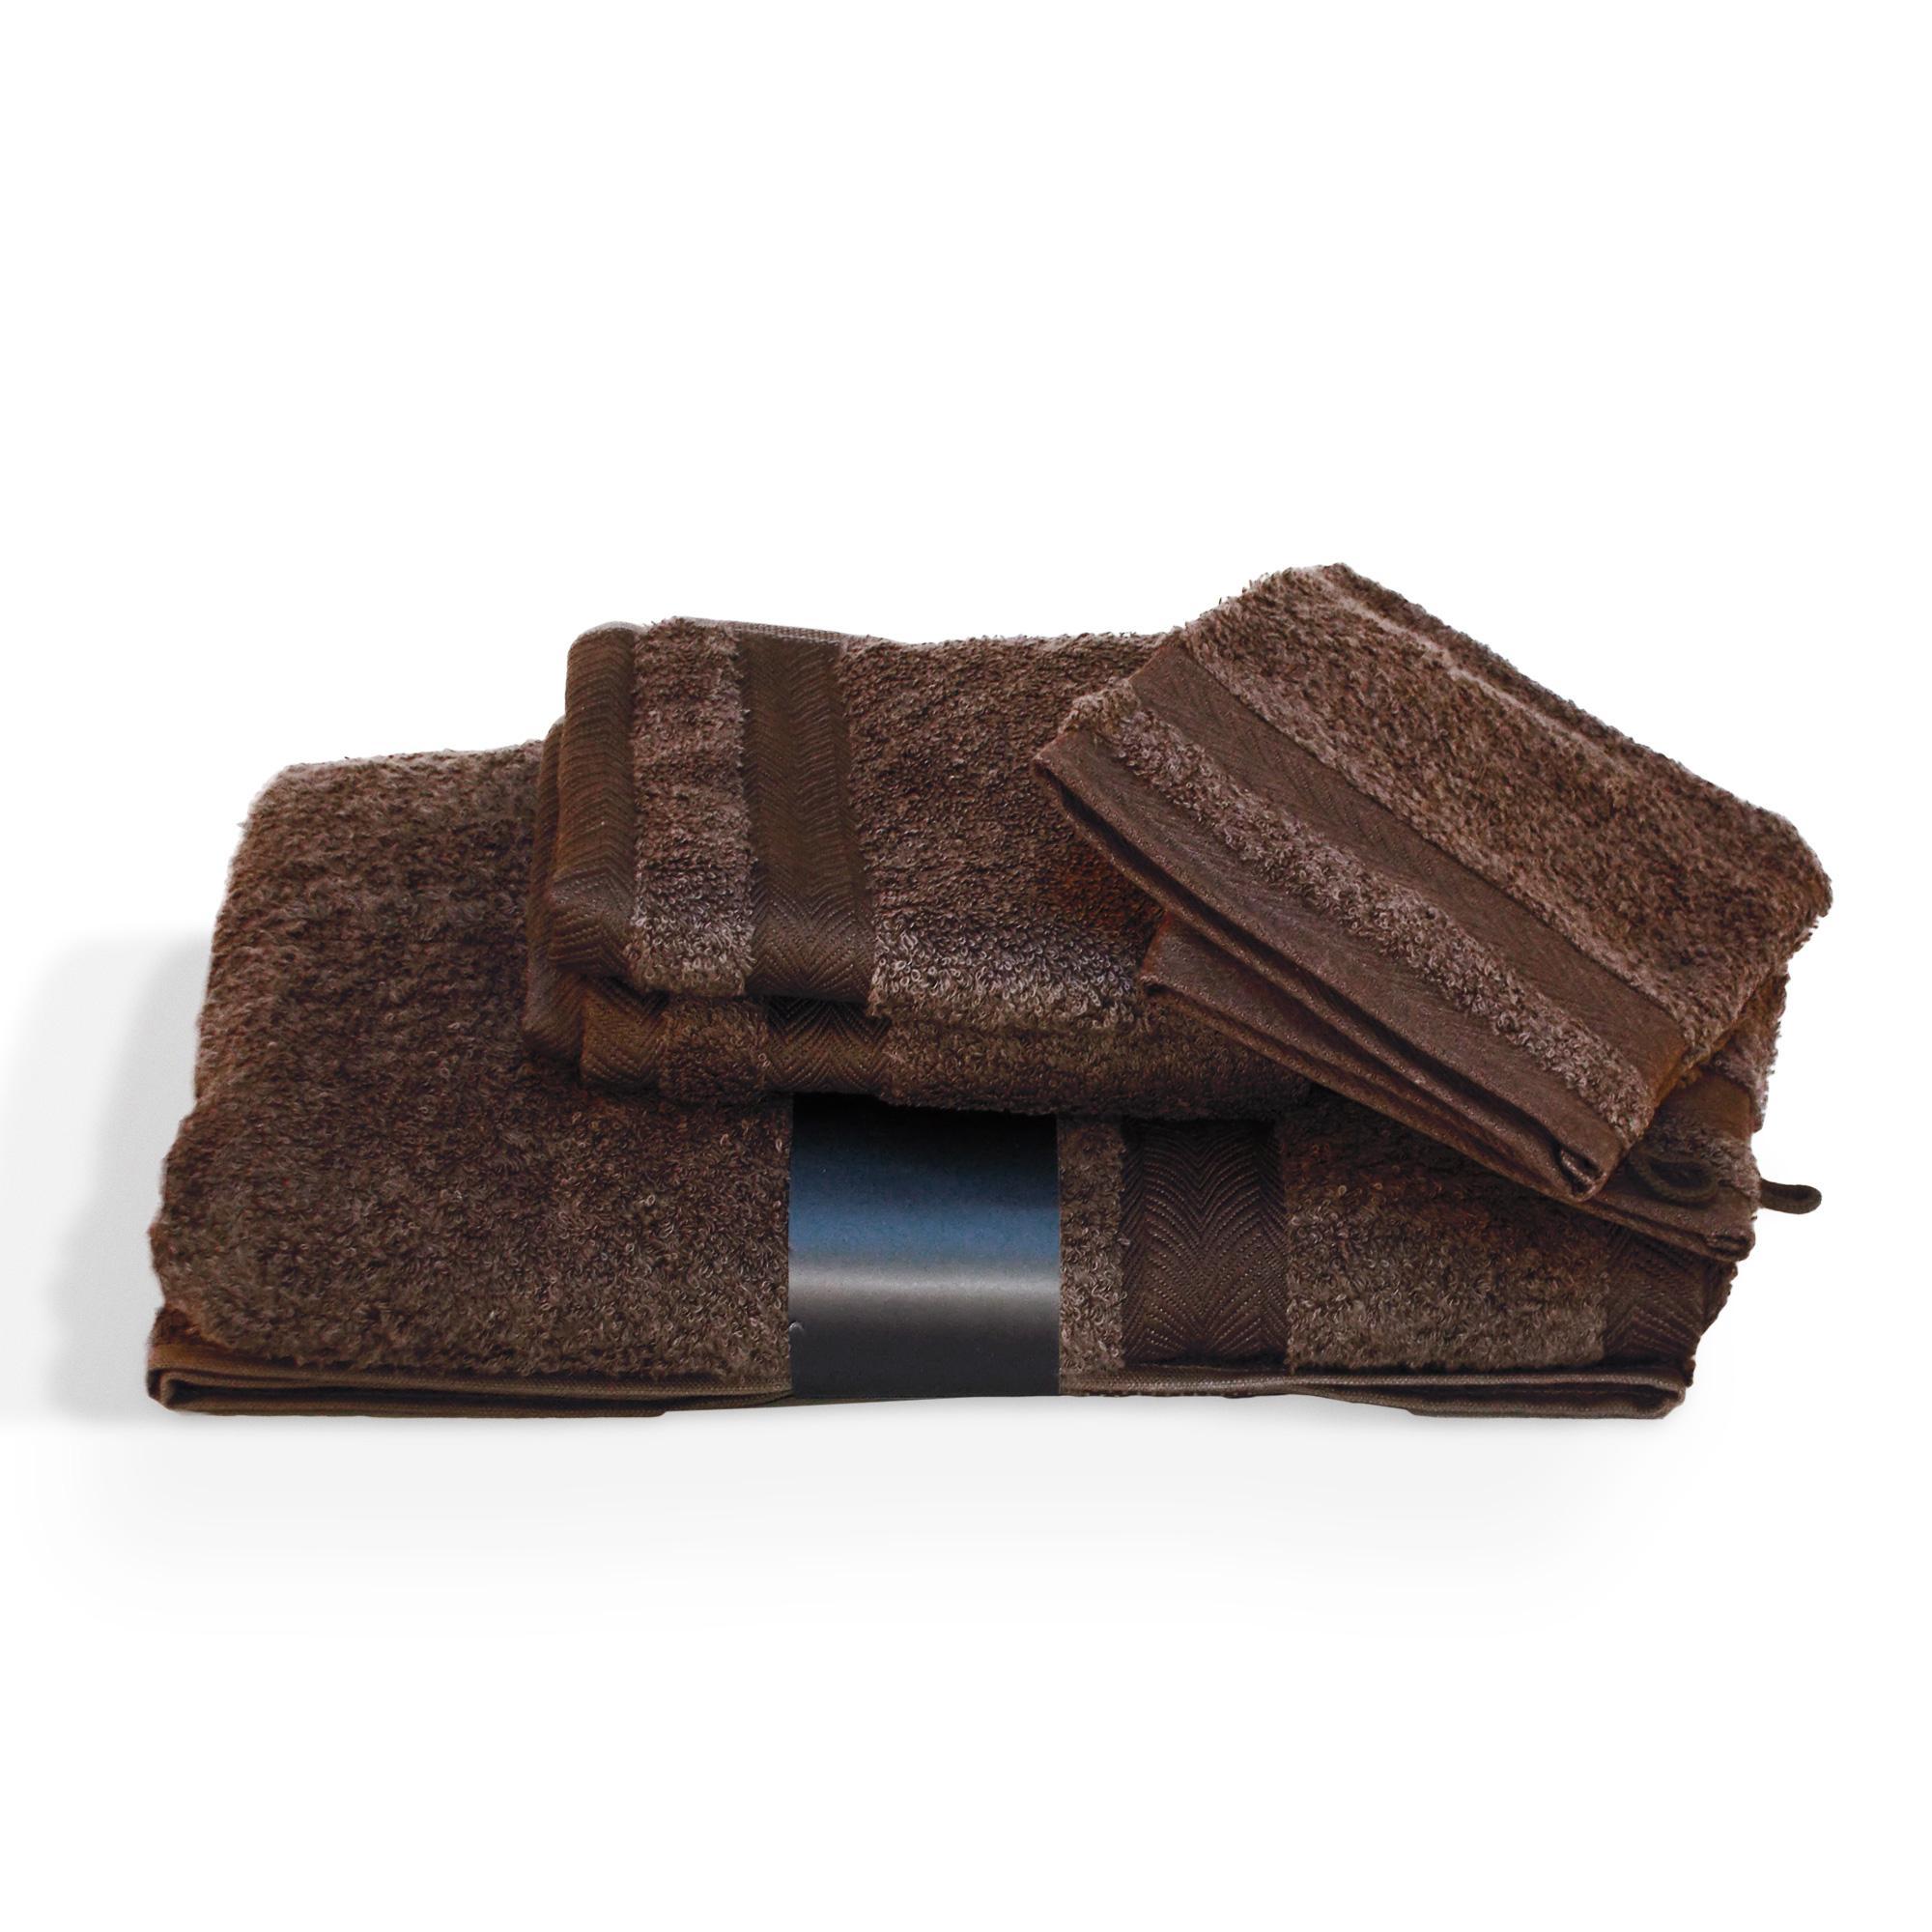 parure de bain 5 pi ces royal cresent chocolat 650g m2 ebay. Black Bedroom Furniture Sets. Home Design Ideas